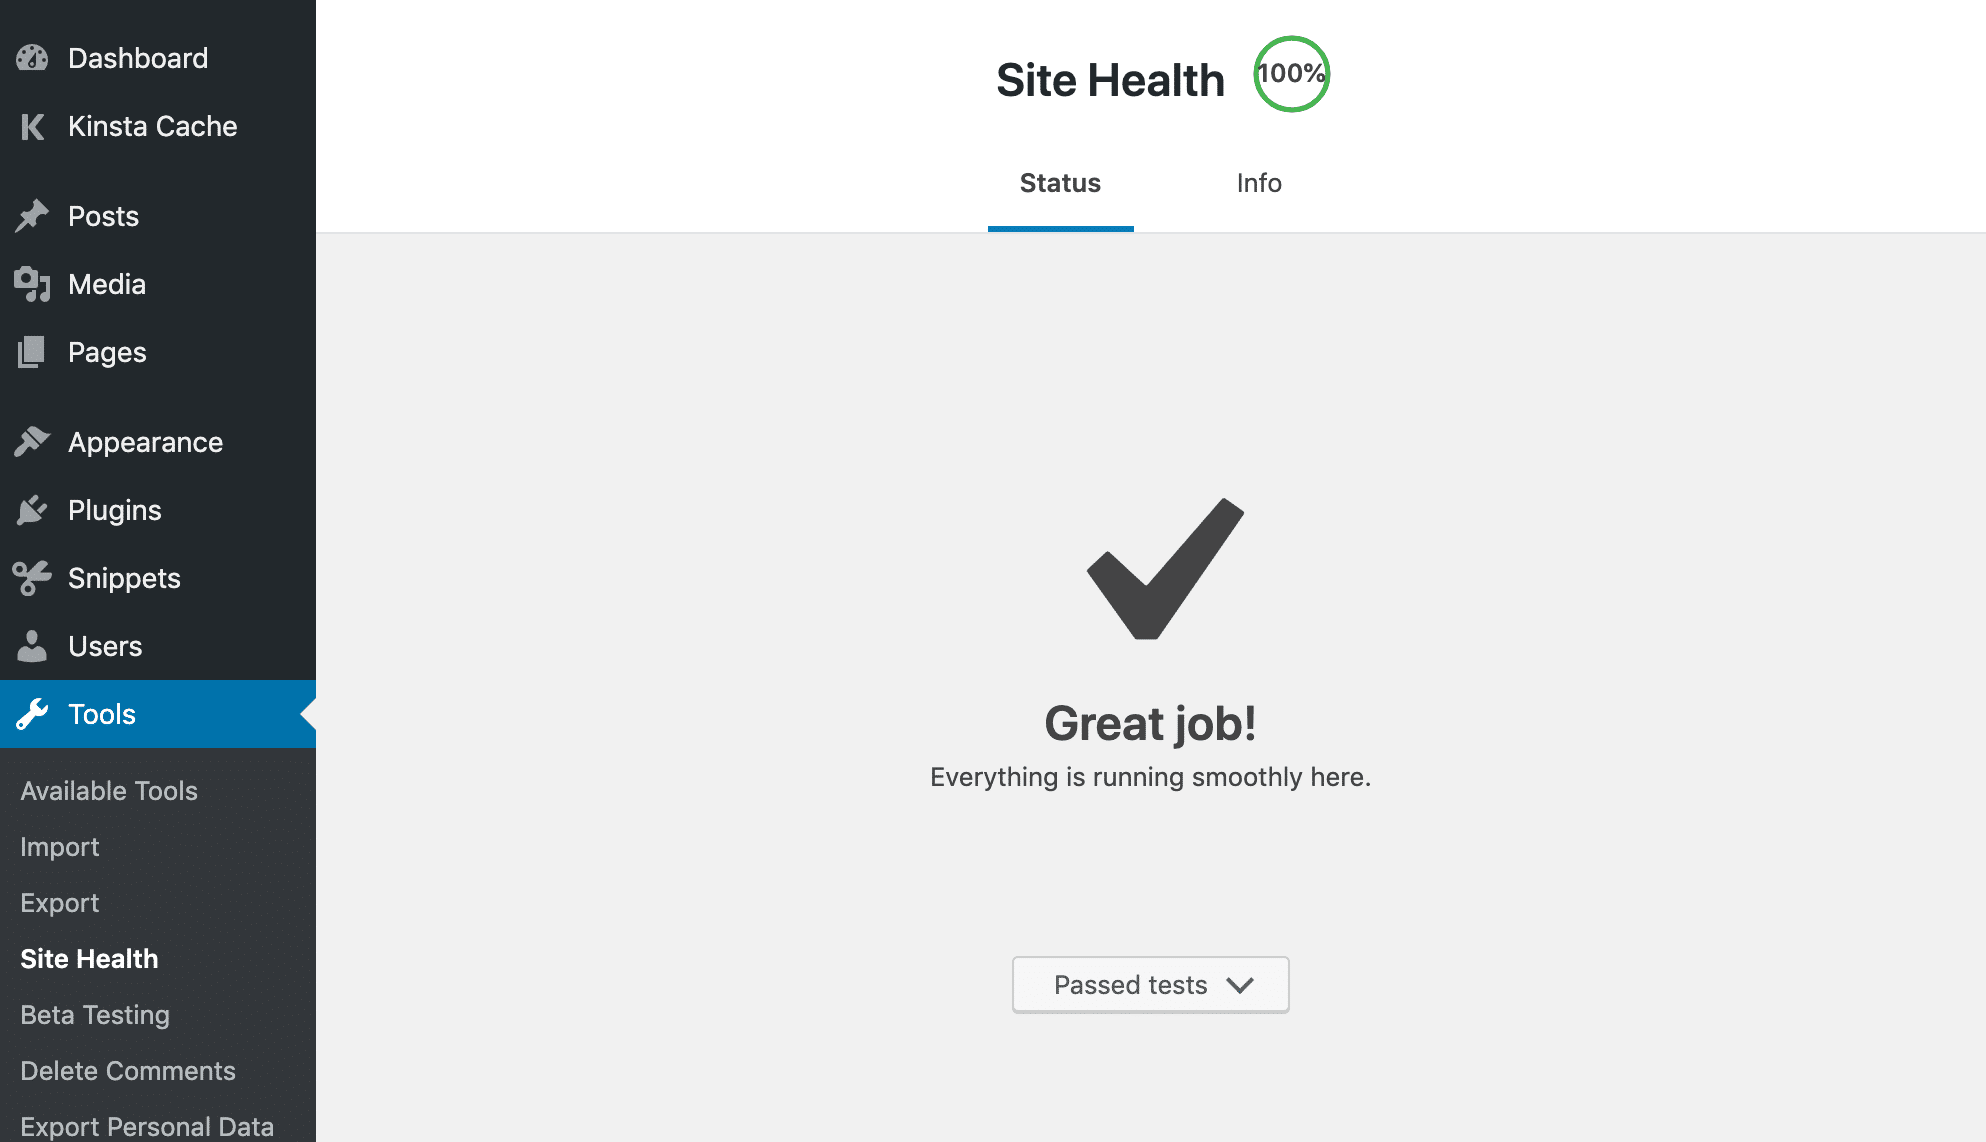 Site Health tool in WordPress - 100% score